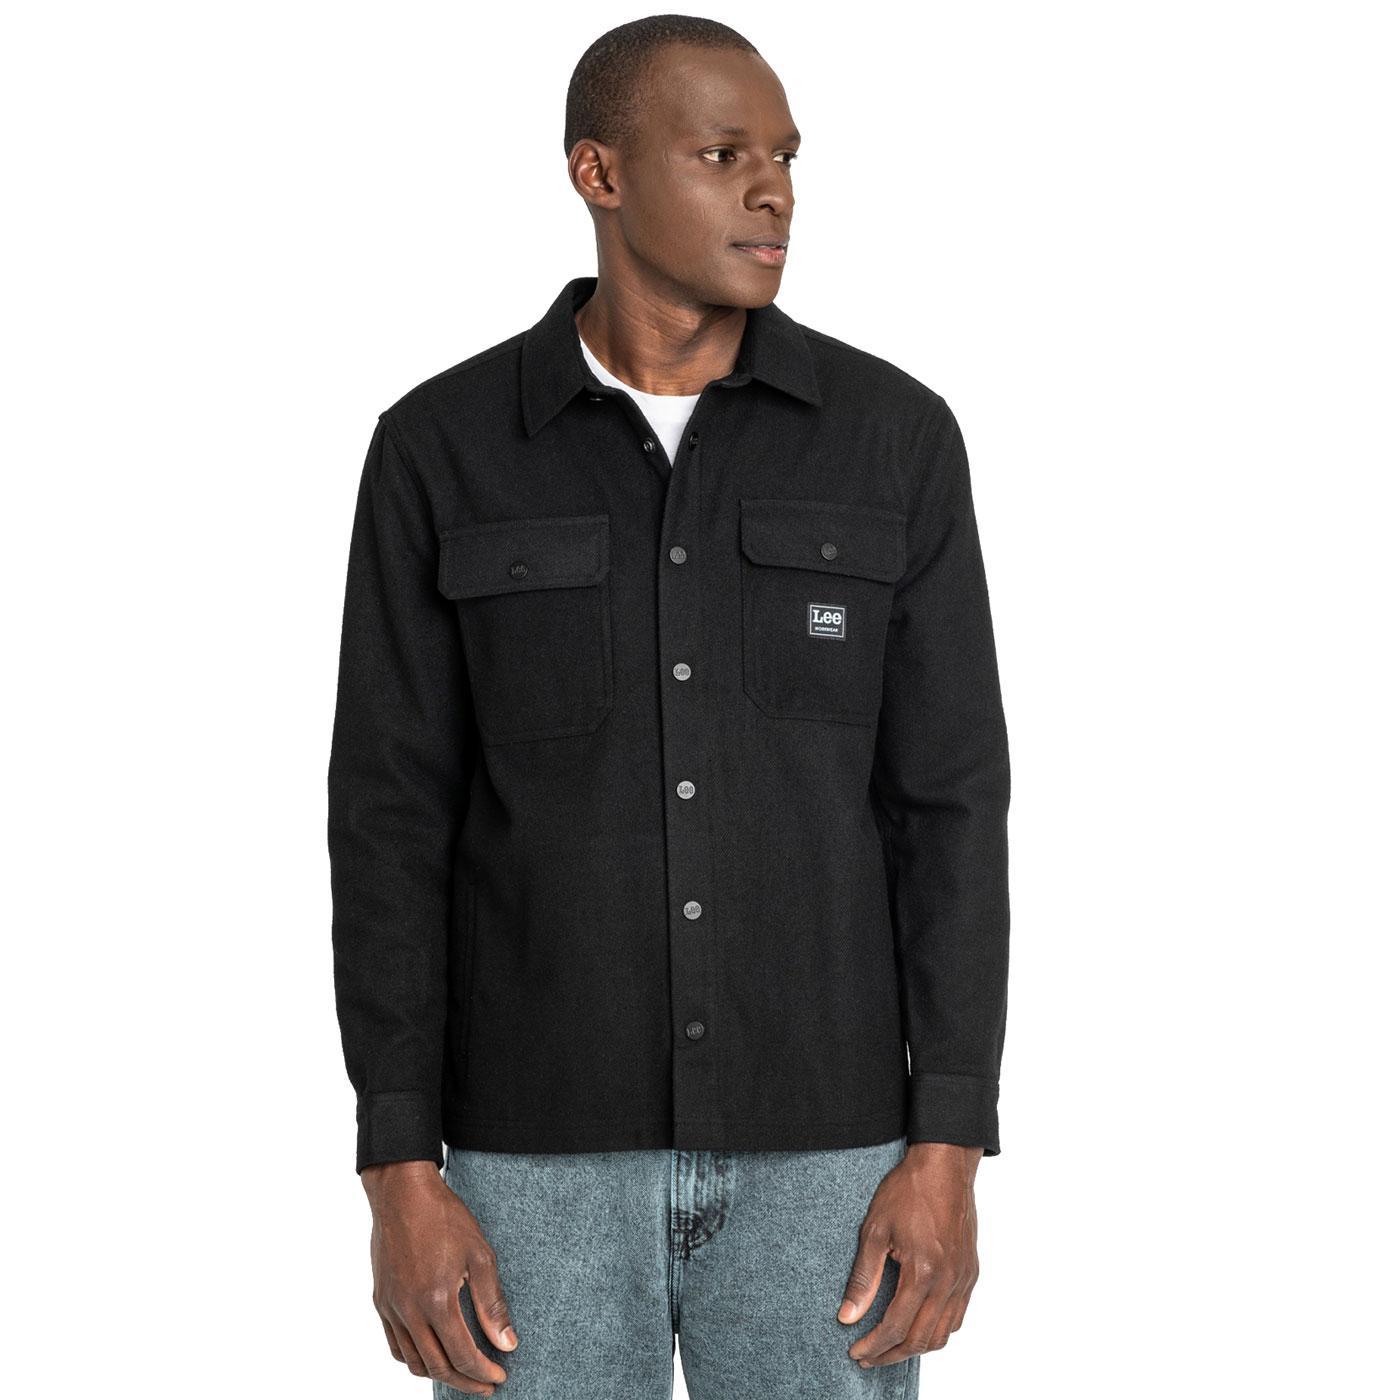 LEE JEANS Men's retro Wool Mix Workwear Overshirt